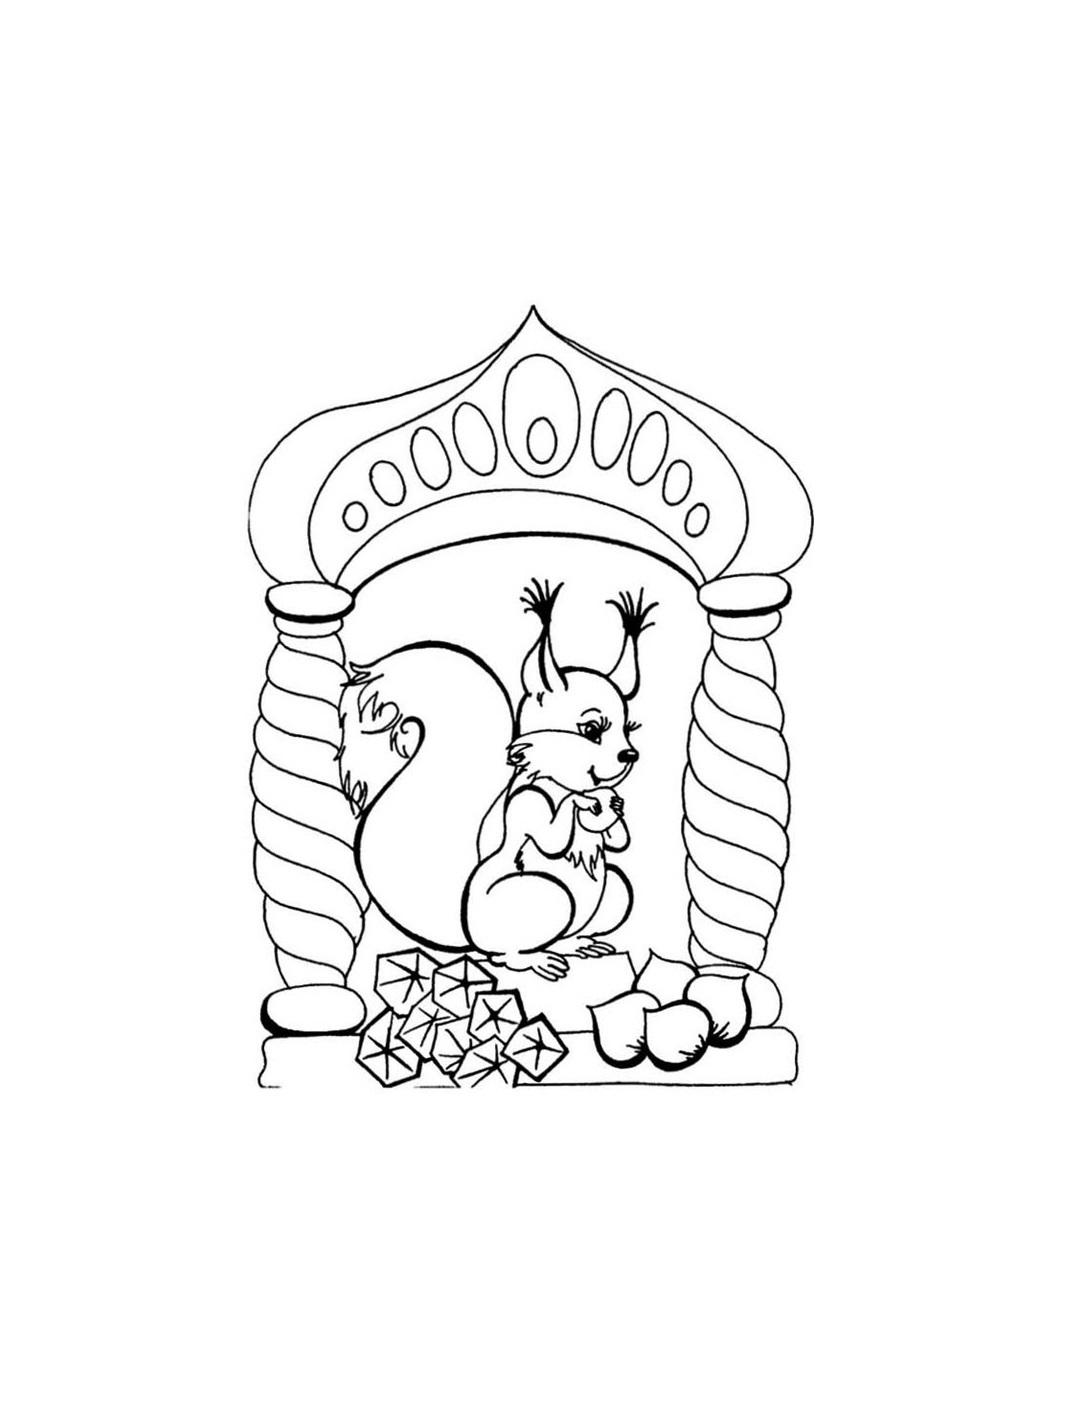 Белка из сказки о царе салтане картинки нарисовать